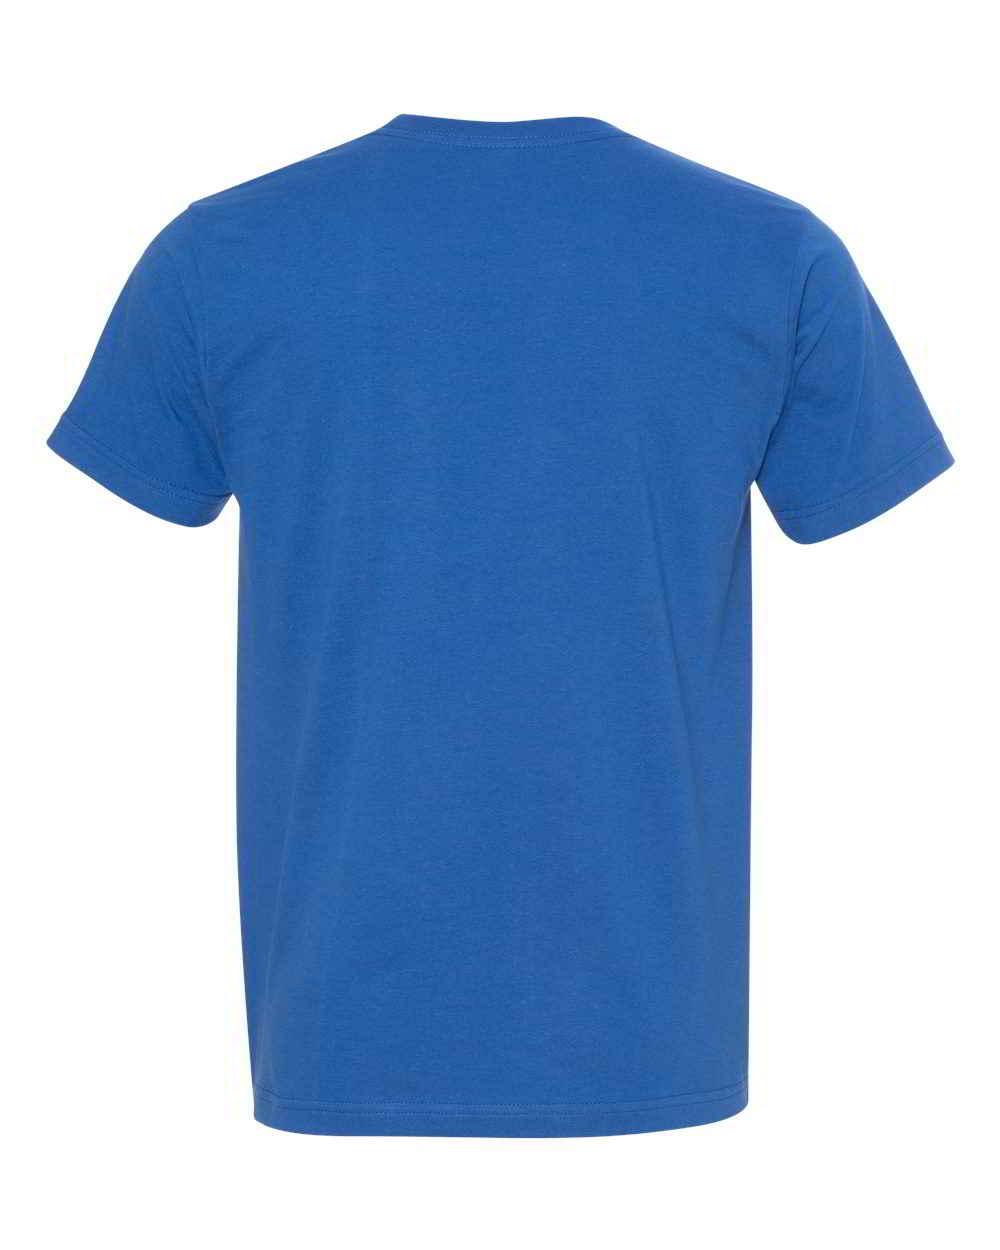 Gildan-Heavy-Cotton-Short-Sleeve-Mens-Blue-T-Shirts-5000 thumbnail 33